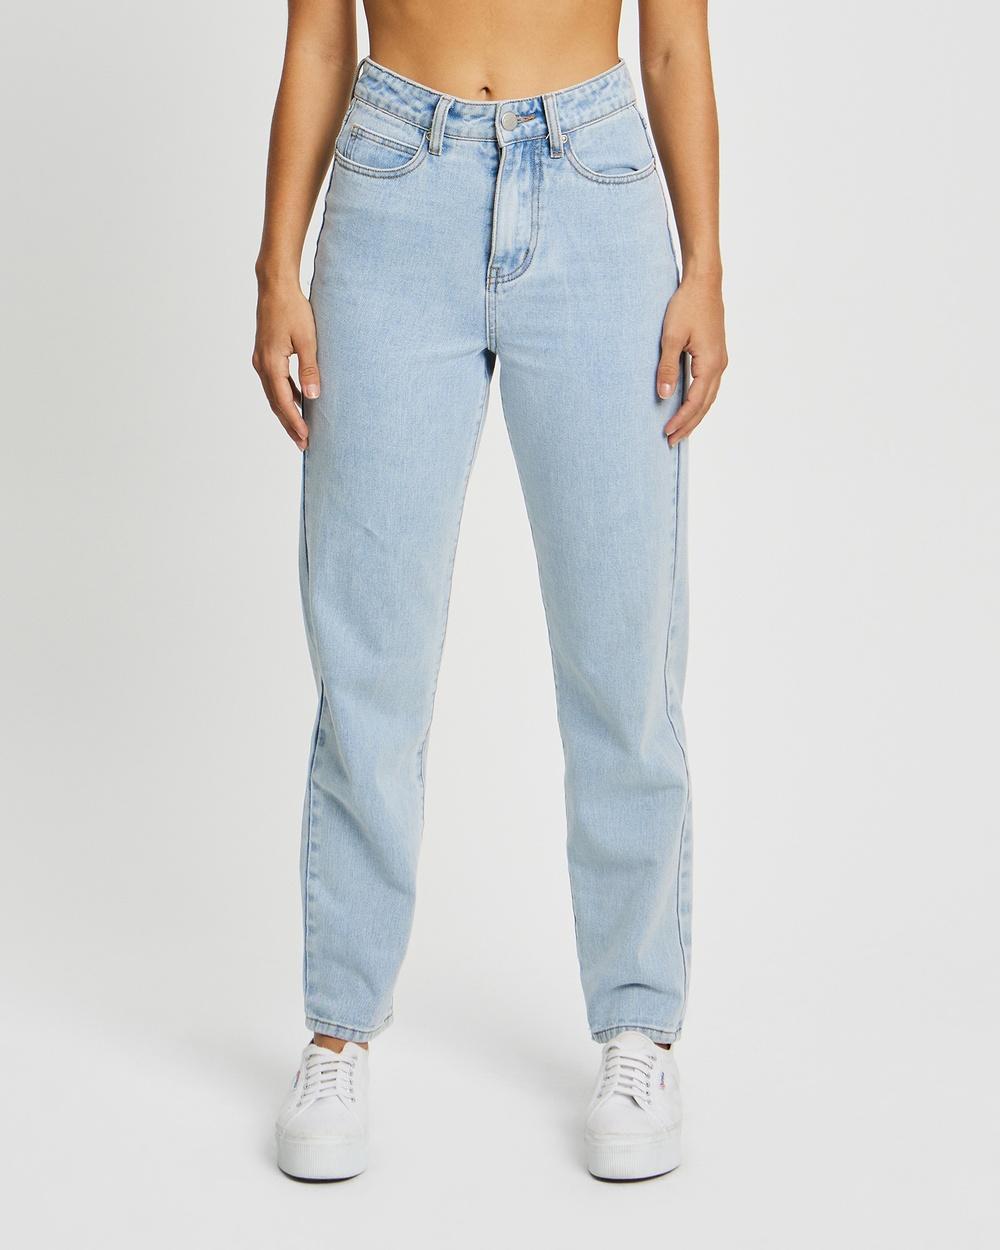 Calli Tahlia Jeans Light Blue Wash Australia